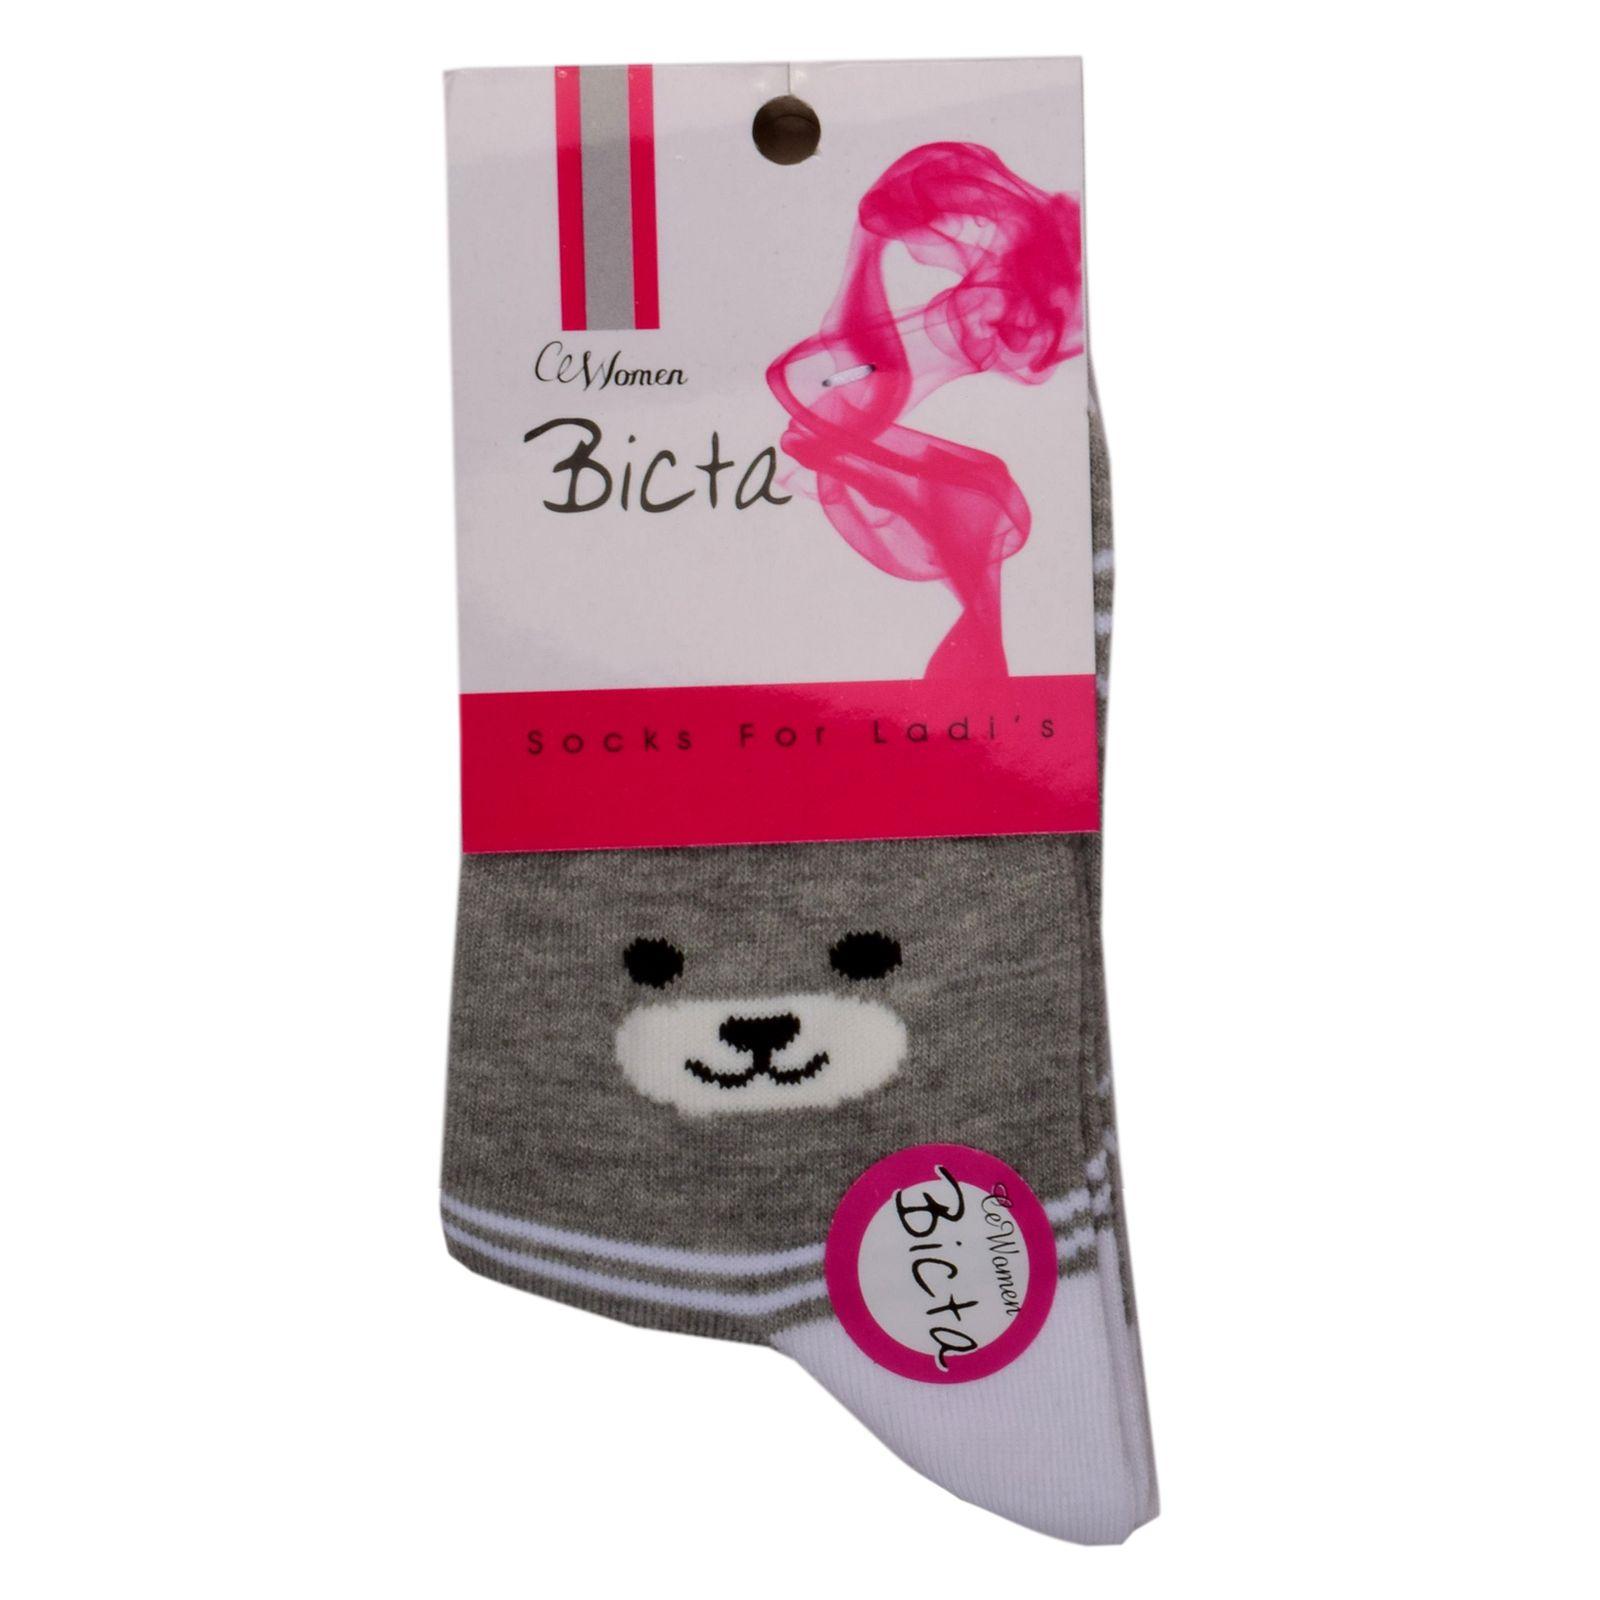 جوراب دخترانه بیکتا طرح گربه کد BC36661 -  - 4